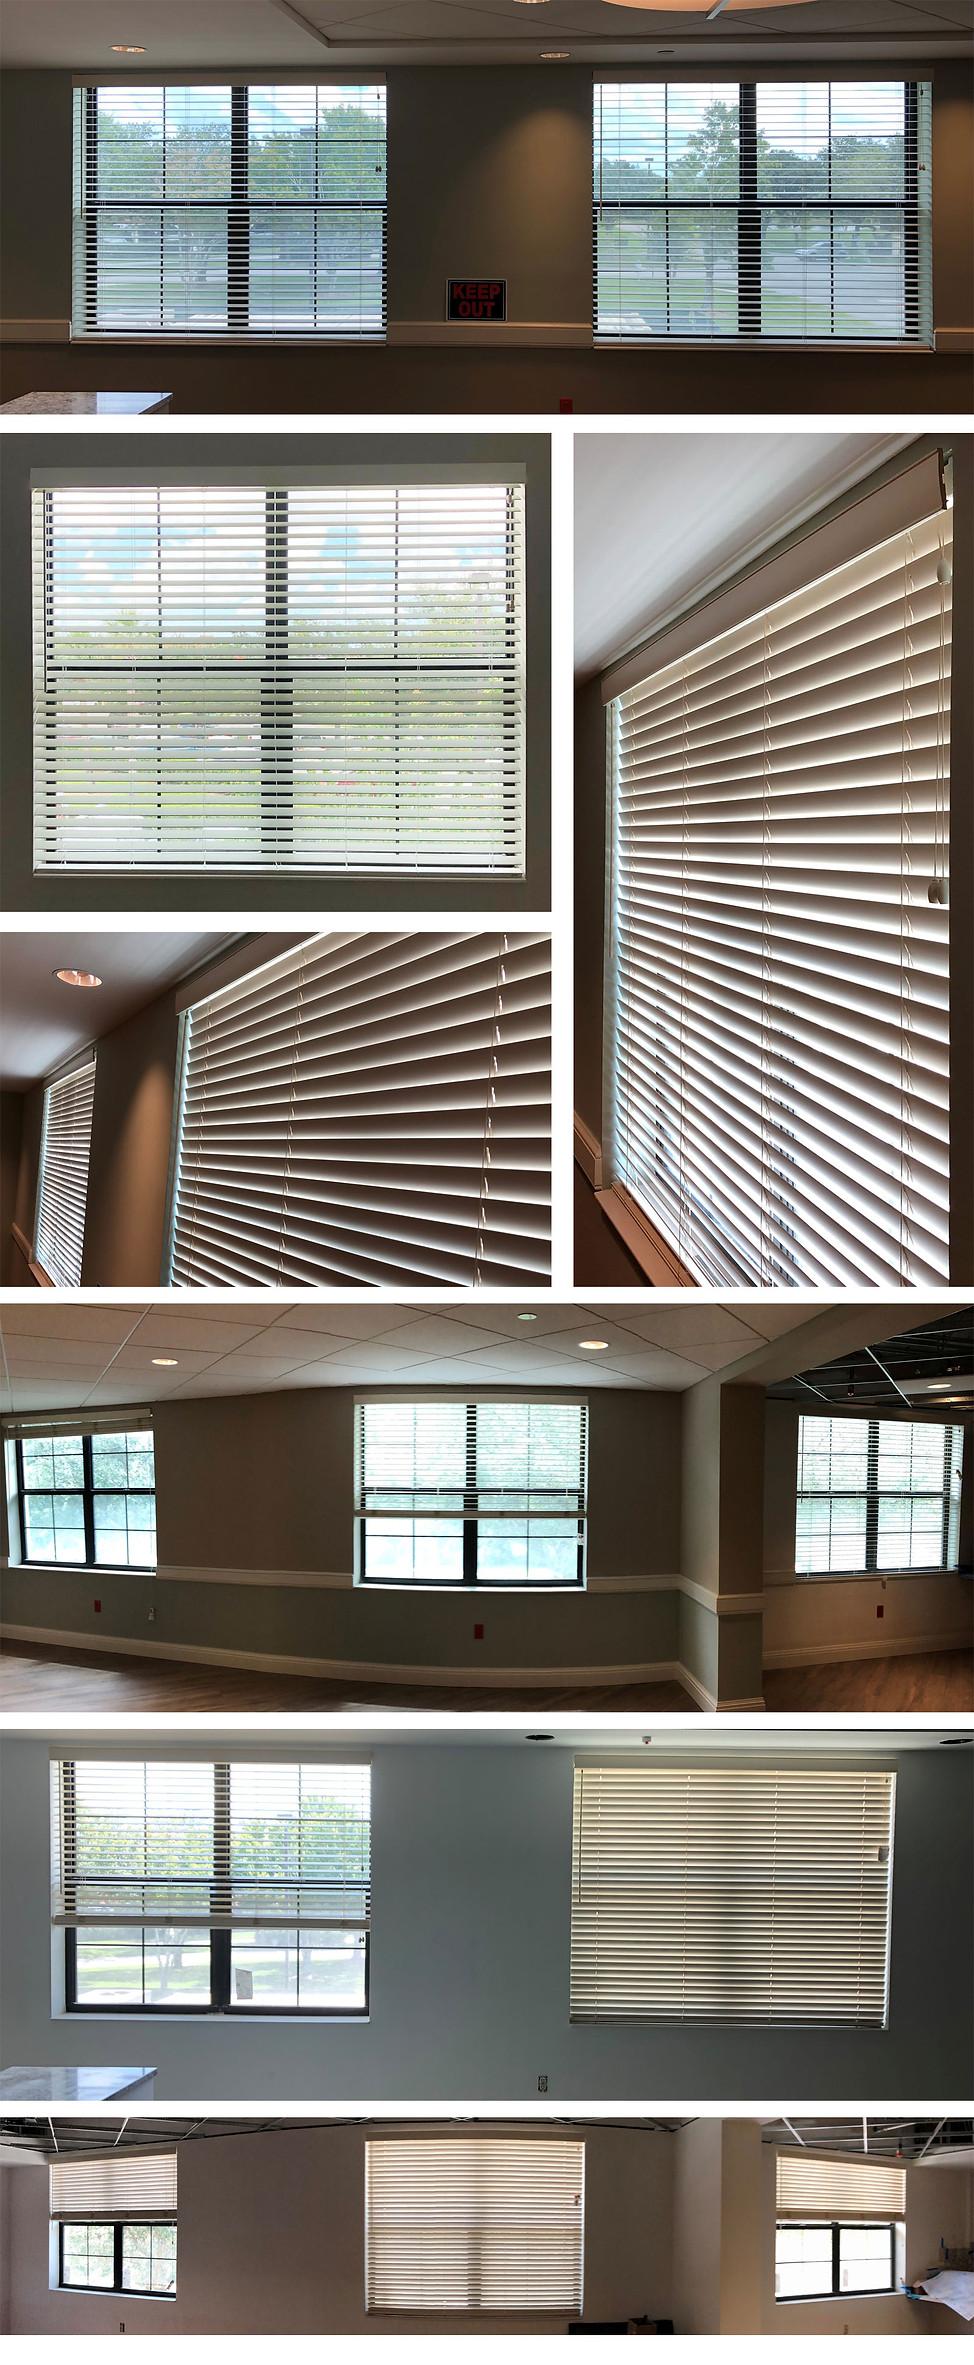 vero-beach-senior-living-window-blinds.j